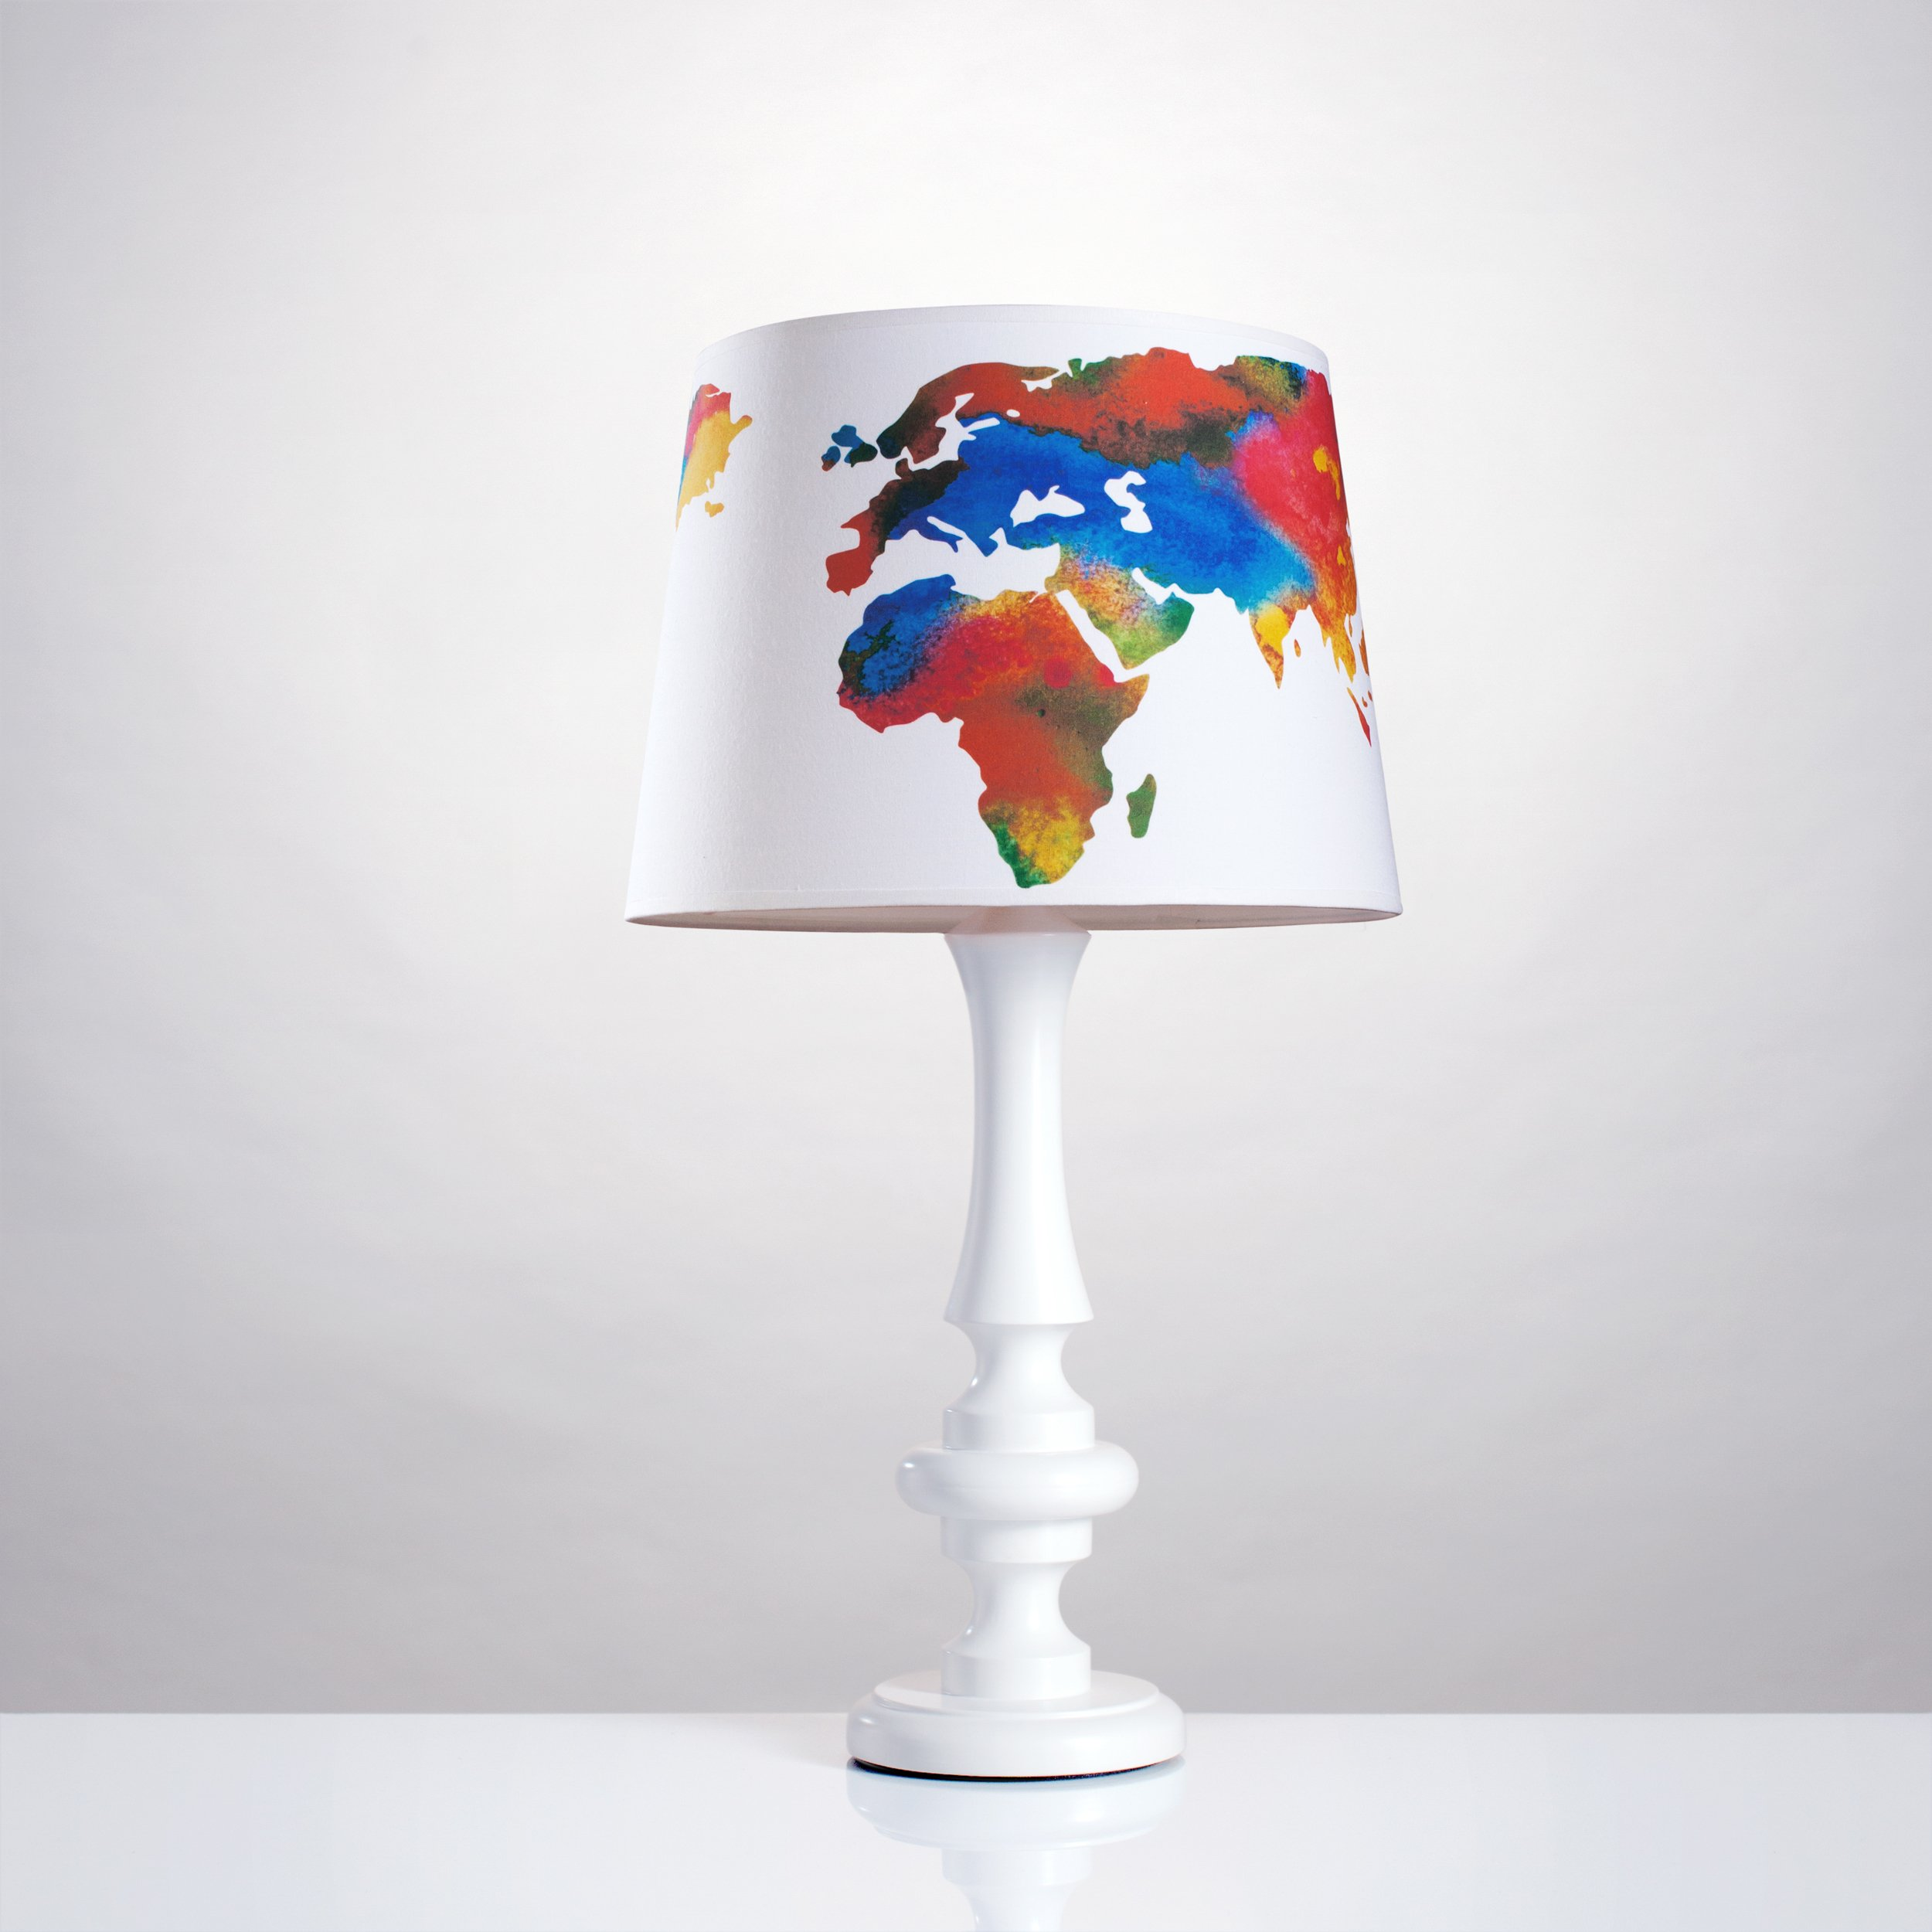 Stolná lampa Mape Sveta veľká noc lampa poľský